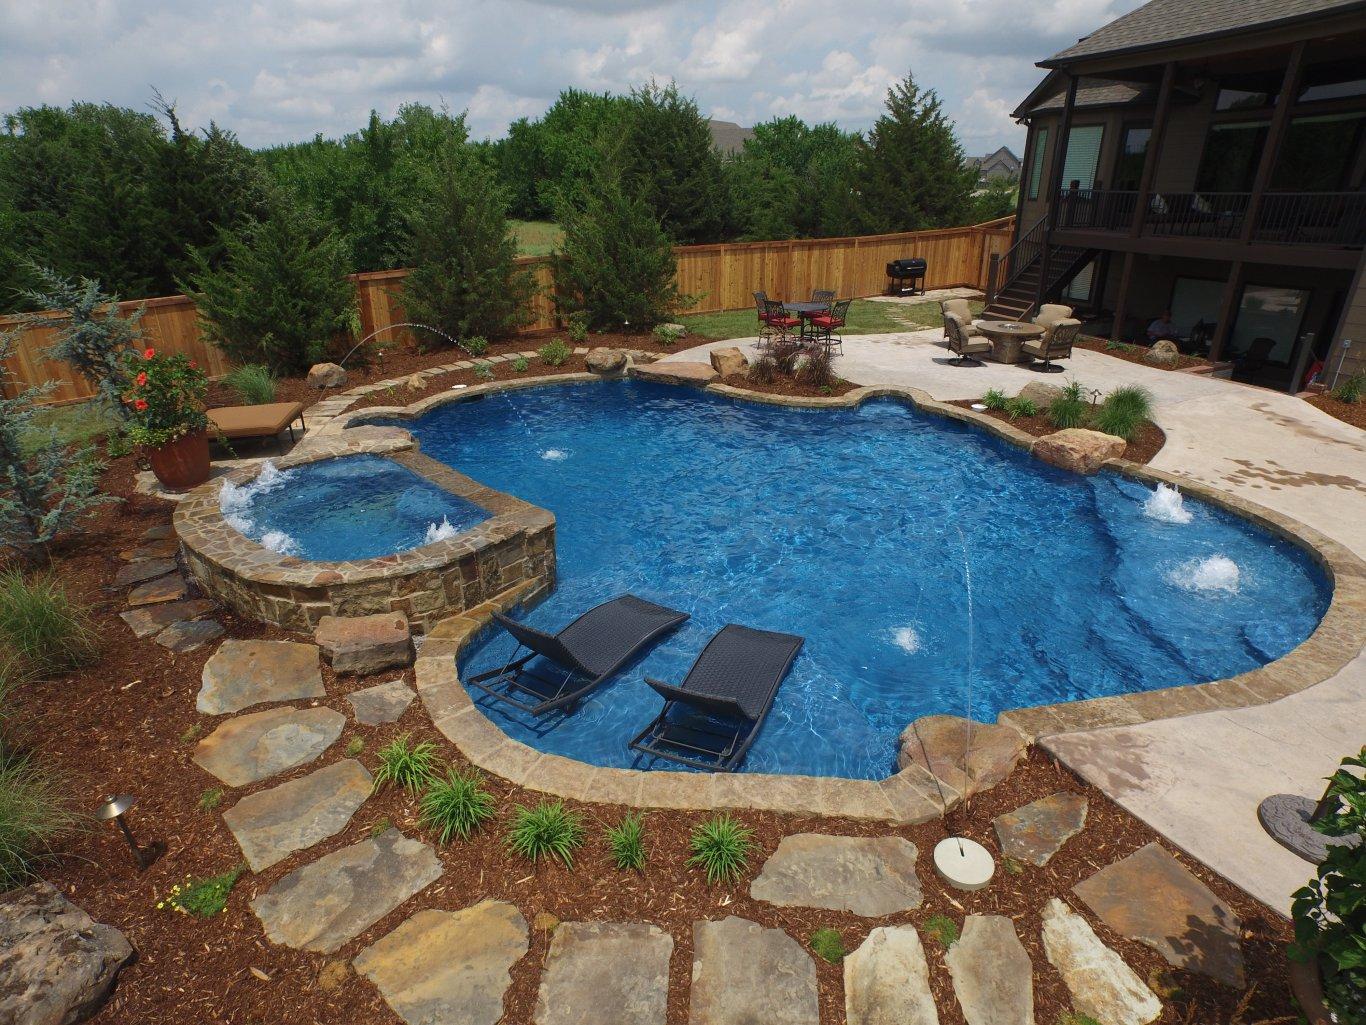 Outdoor Kitchens | Pools | Wichita, KS. | Treescapes